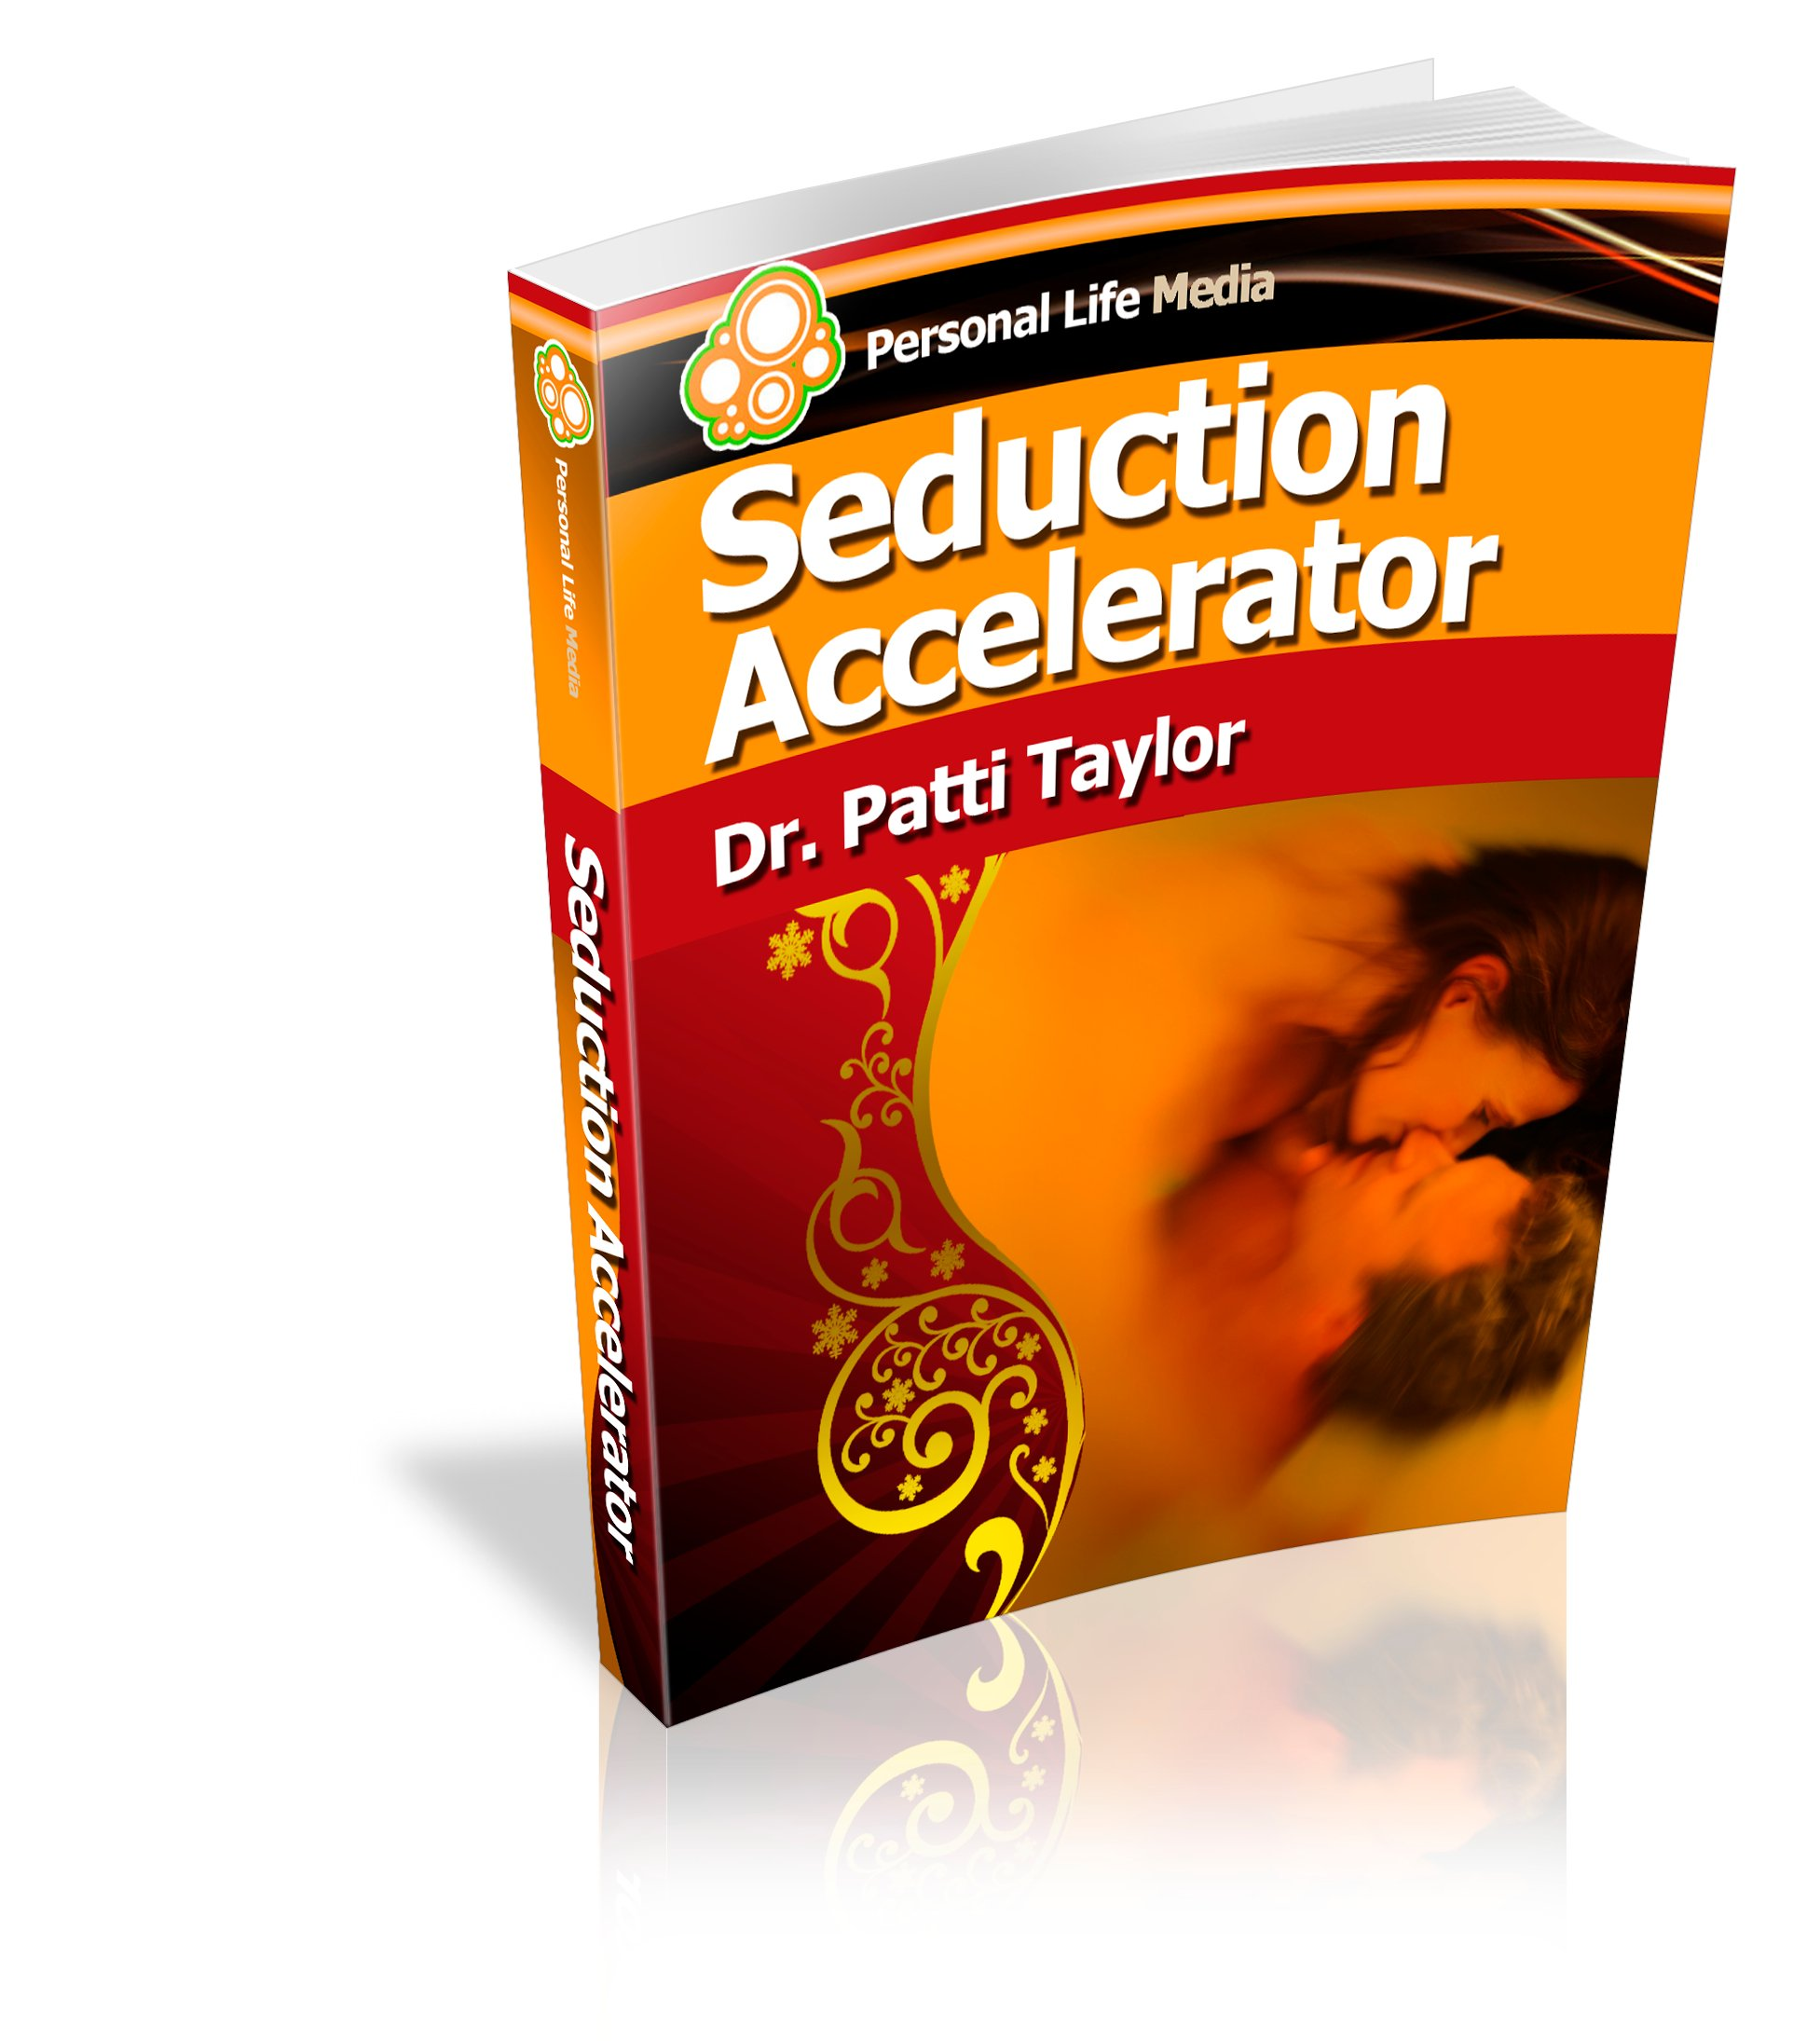 https://members.personallifemedia.com/wp-content/uploads/2010/10/Seduction-Accelerator-Cover.jpg